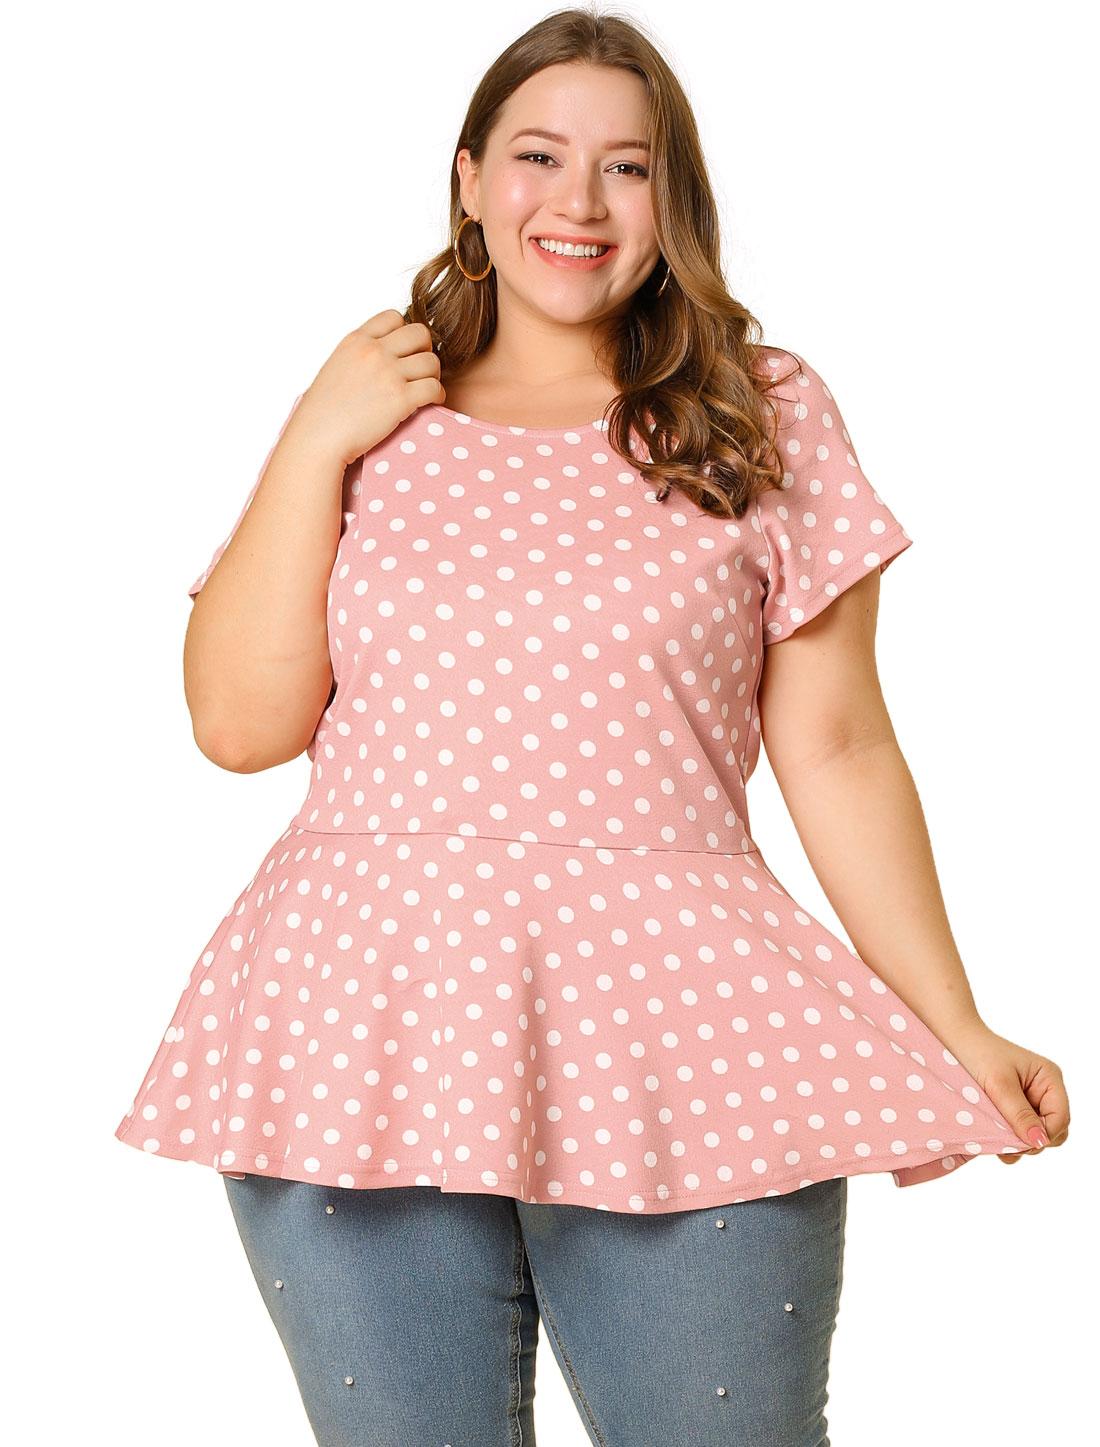 Women Plus Size Short Sleeves Polka Dots Peplum Top Pink 3X